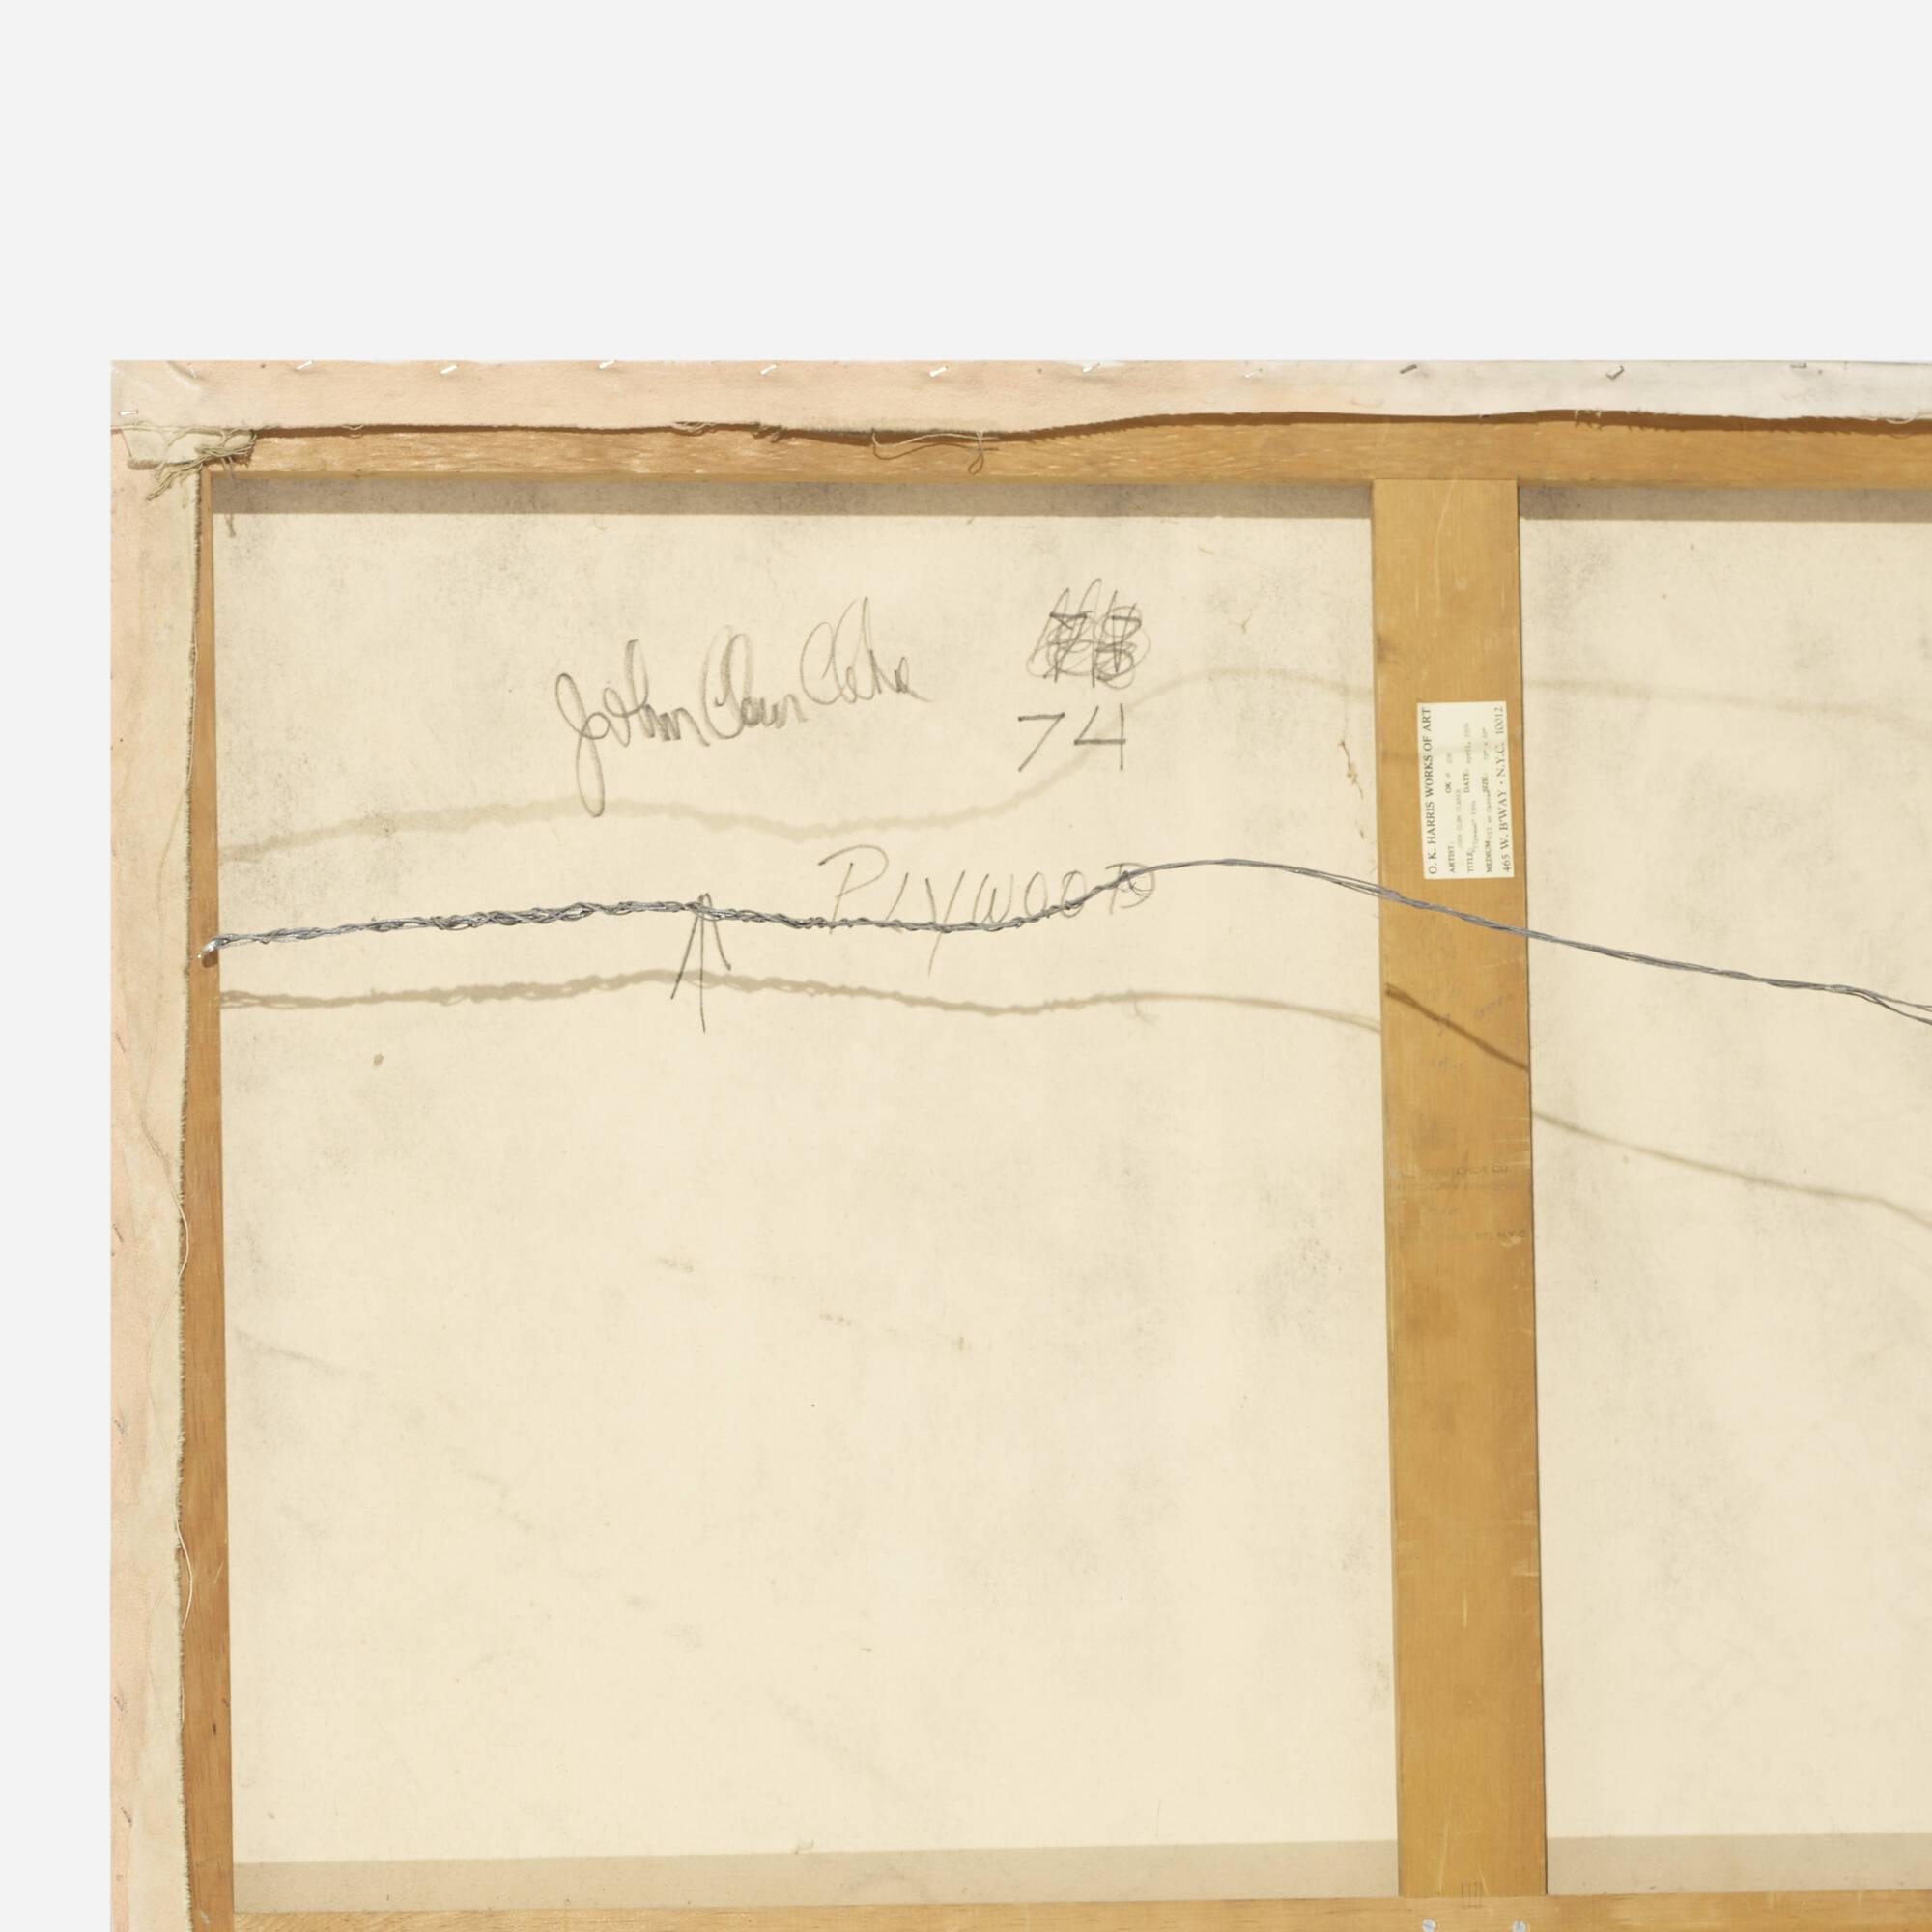 248: John Clem Clarke / Plywood (2 of 2)